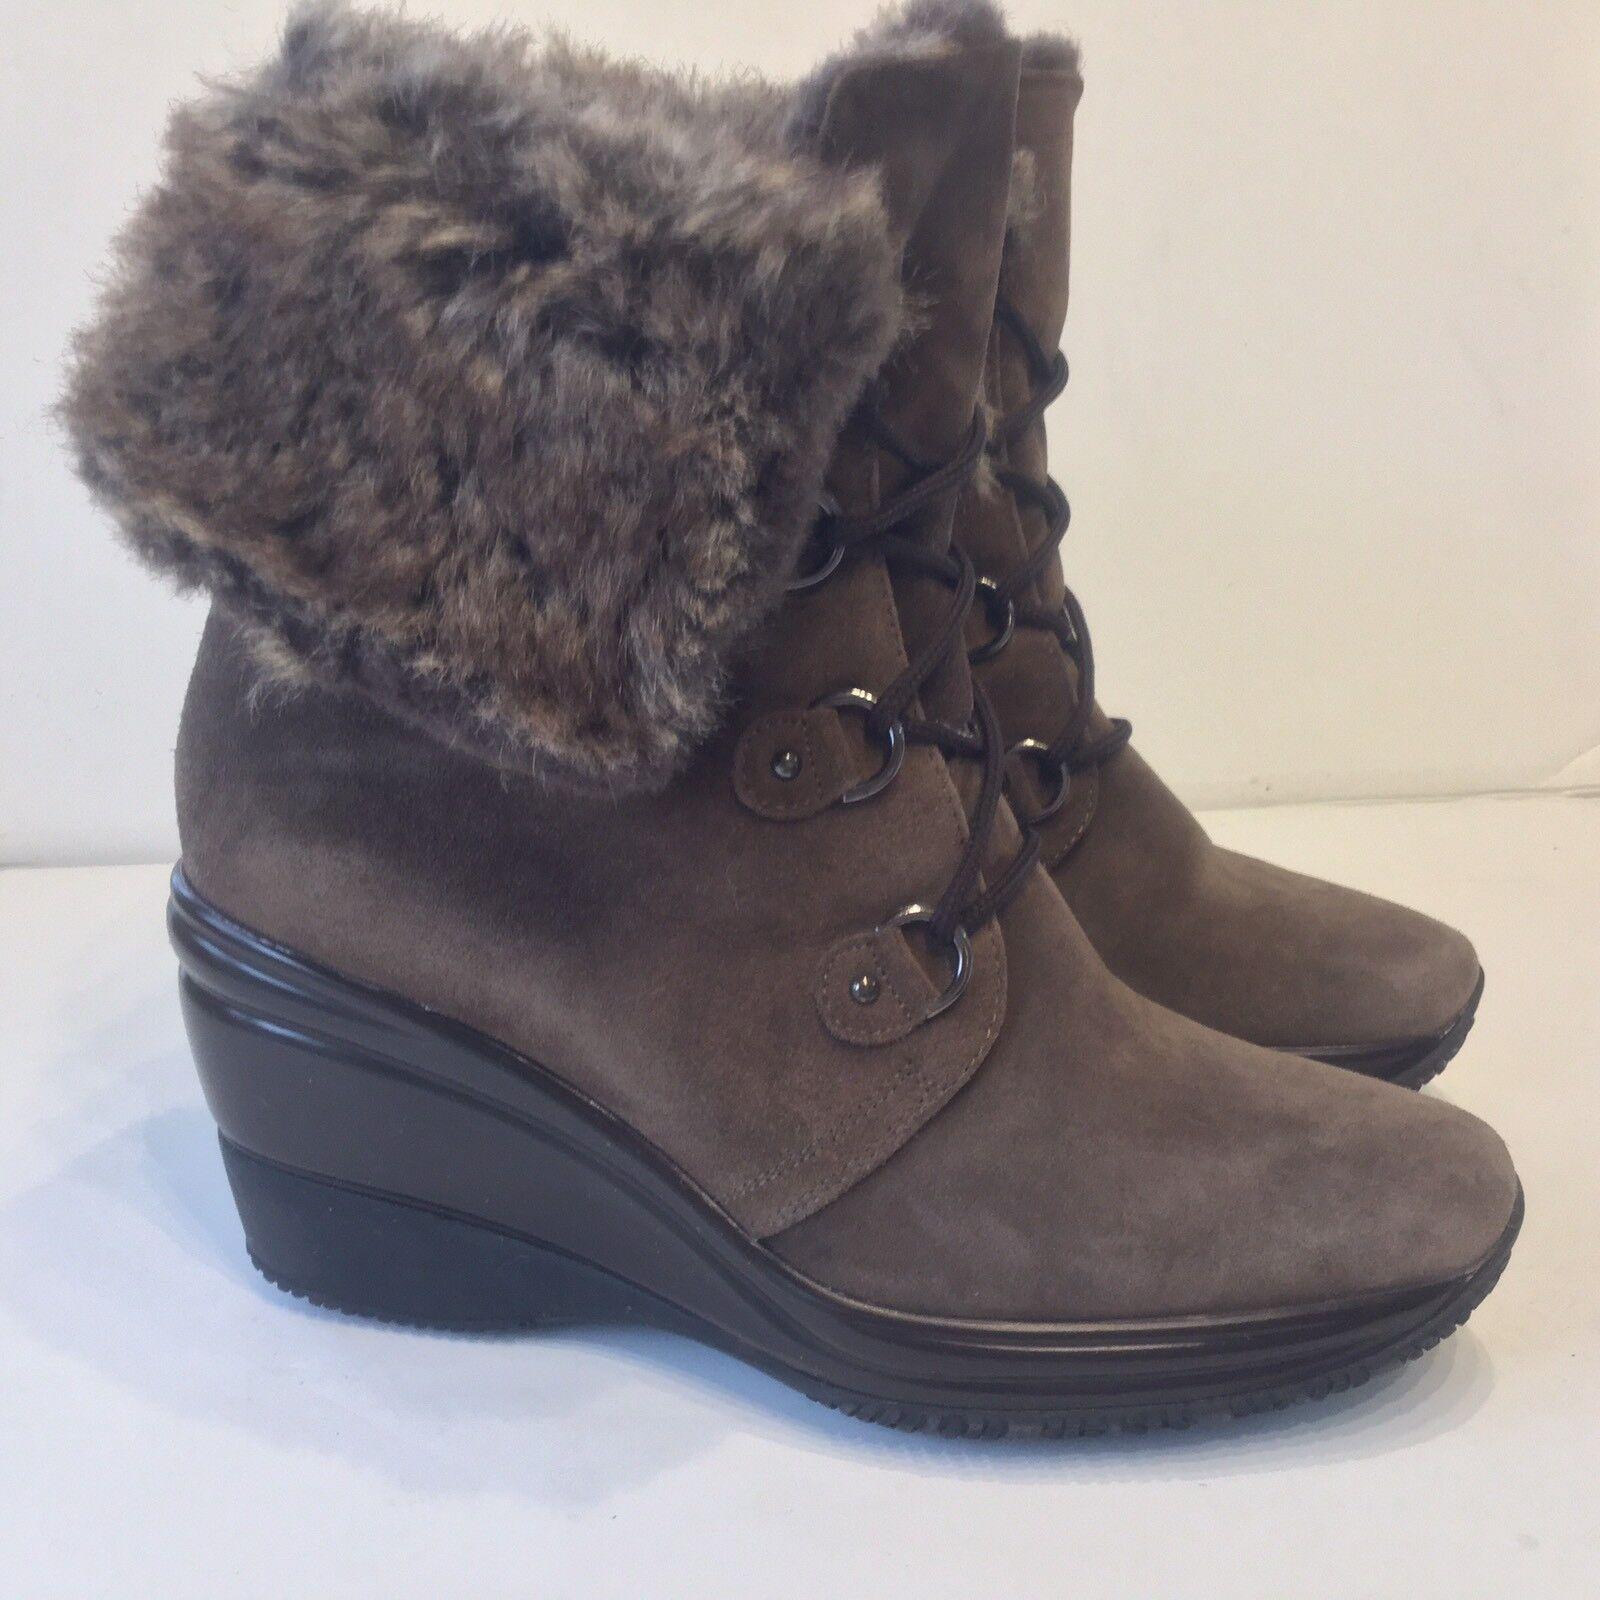 NEW AQUATALIA WOMENS Weatherproof Leather Faux Fur Trim Wedge Booties SZ 11